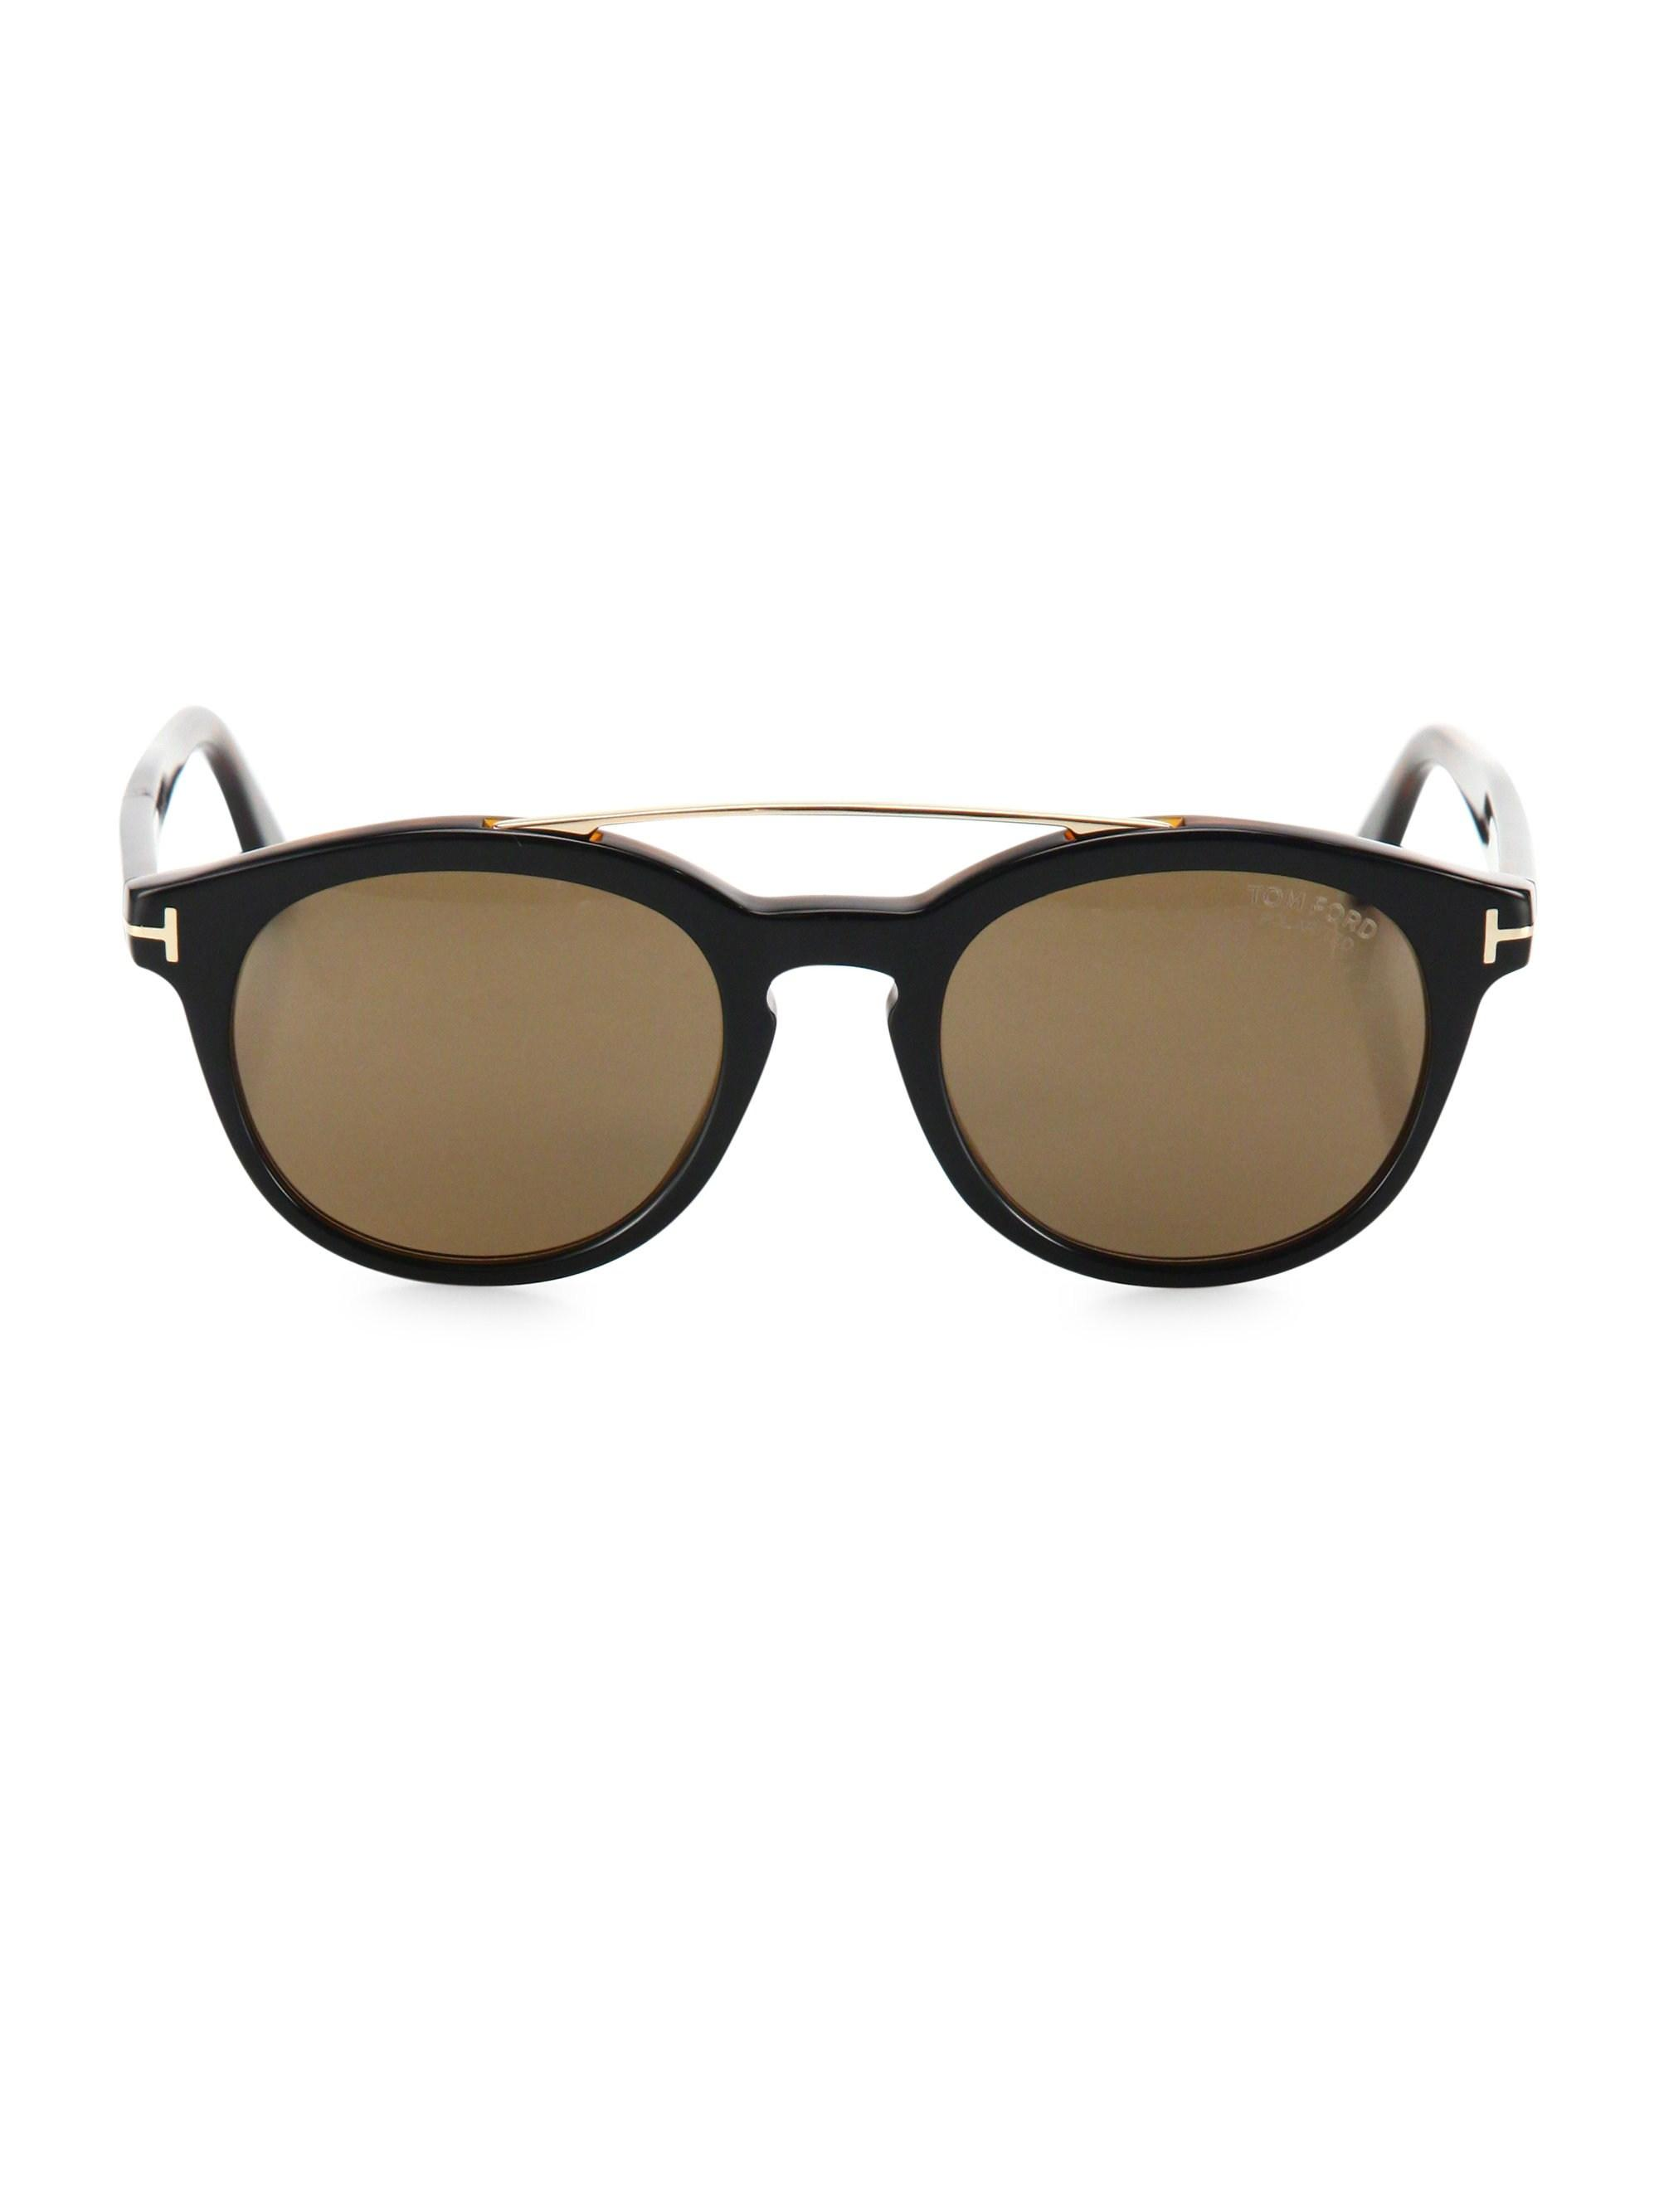 1e4a6081e24 Lyst - Tom Ford Newman 53mm Round Sunglasses in Black for Men